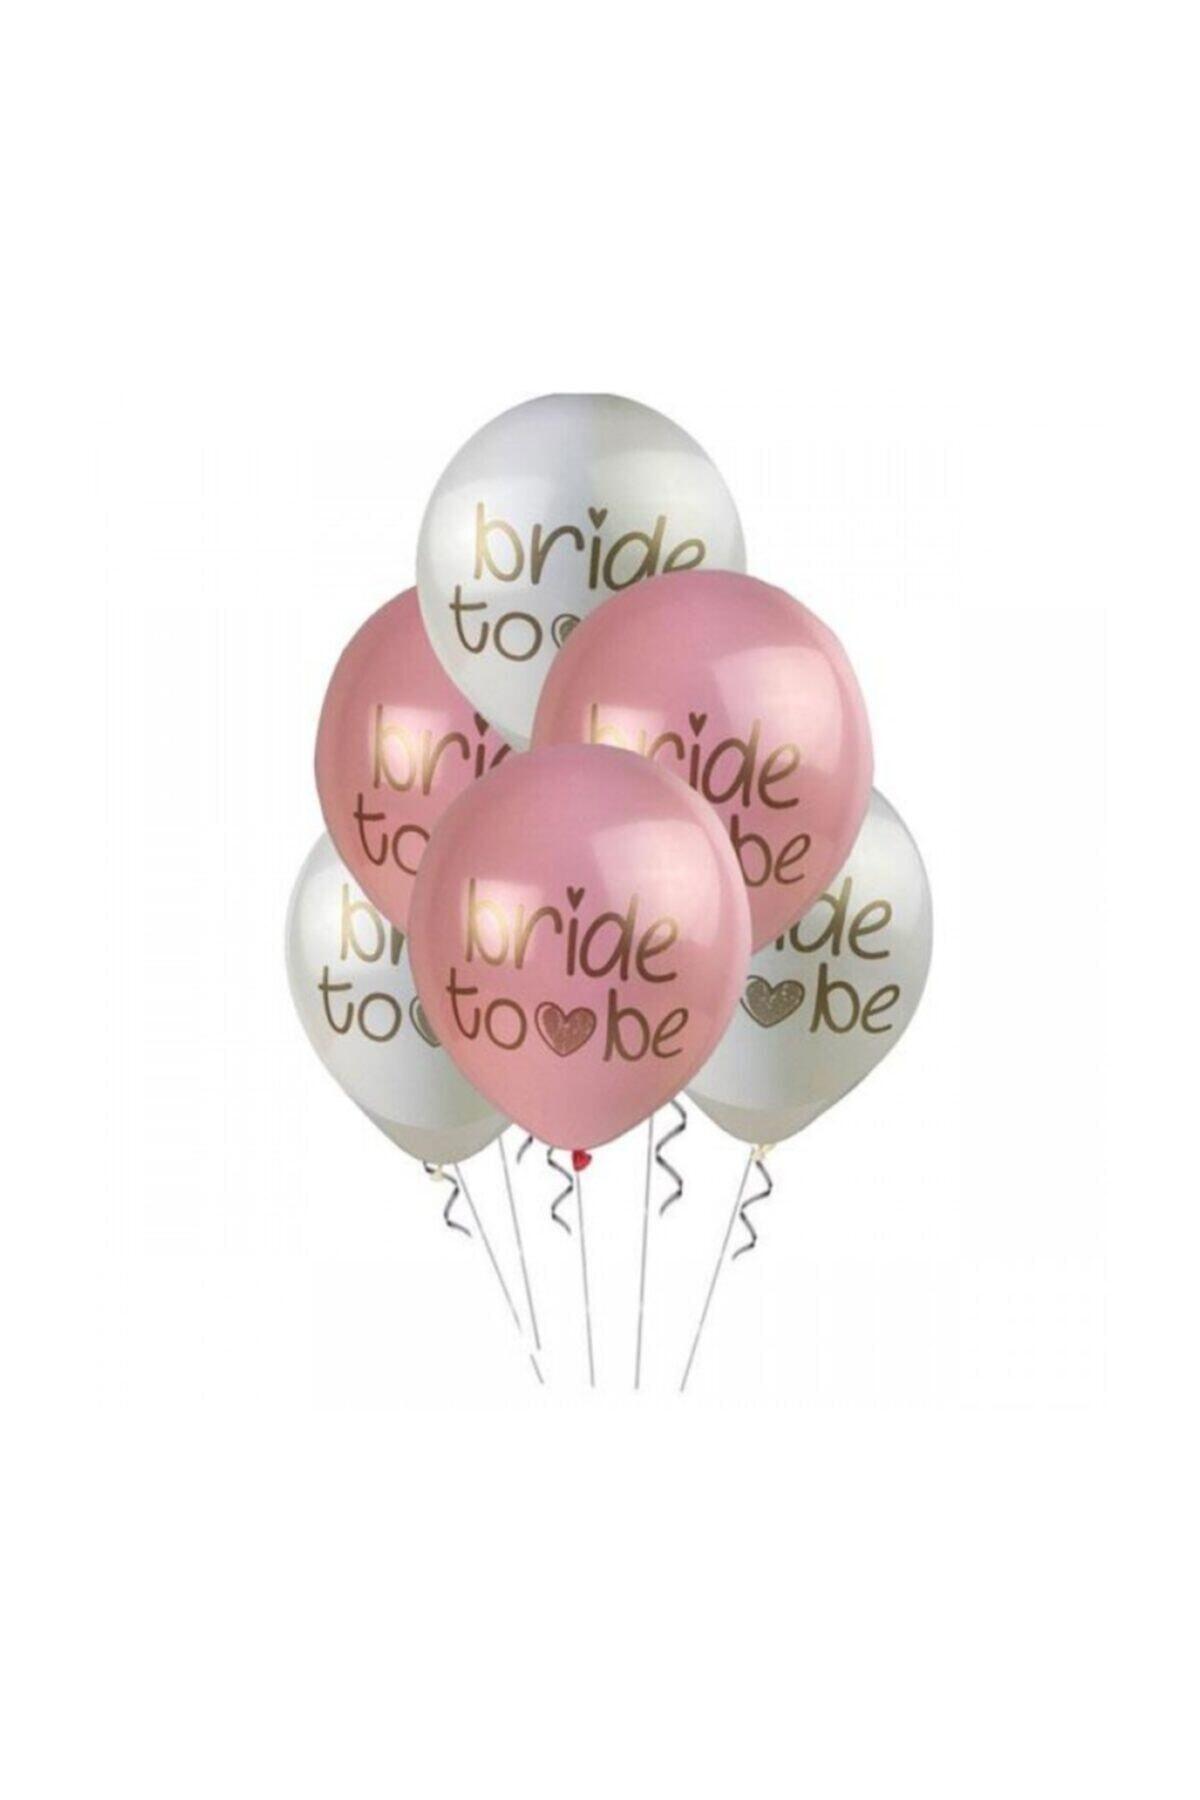 "Bride To Be Kalisan Marka 12"" Inç Balon 5 Adet"